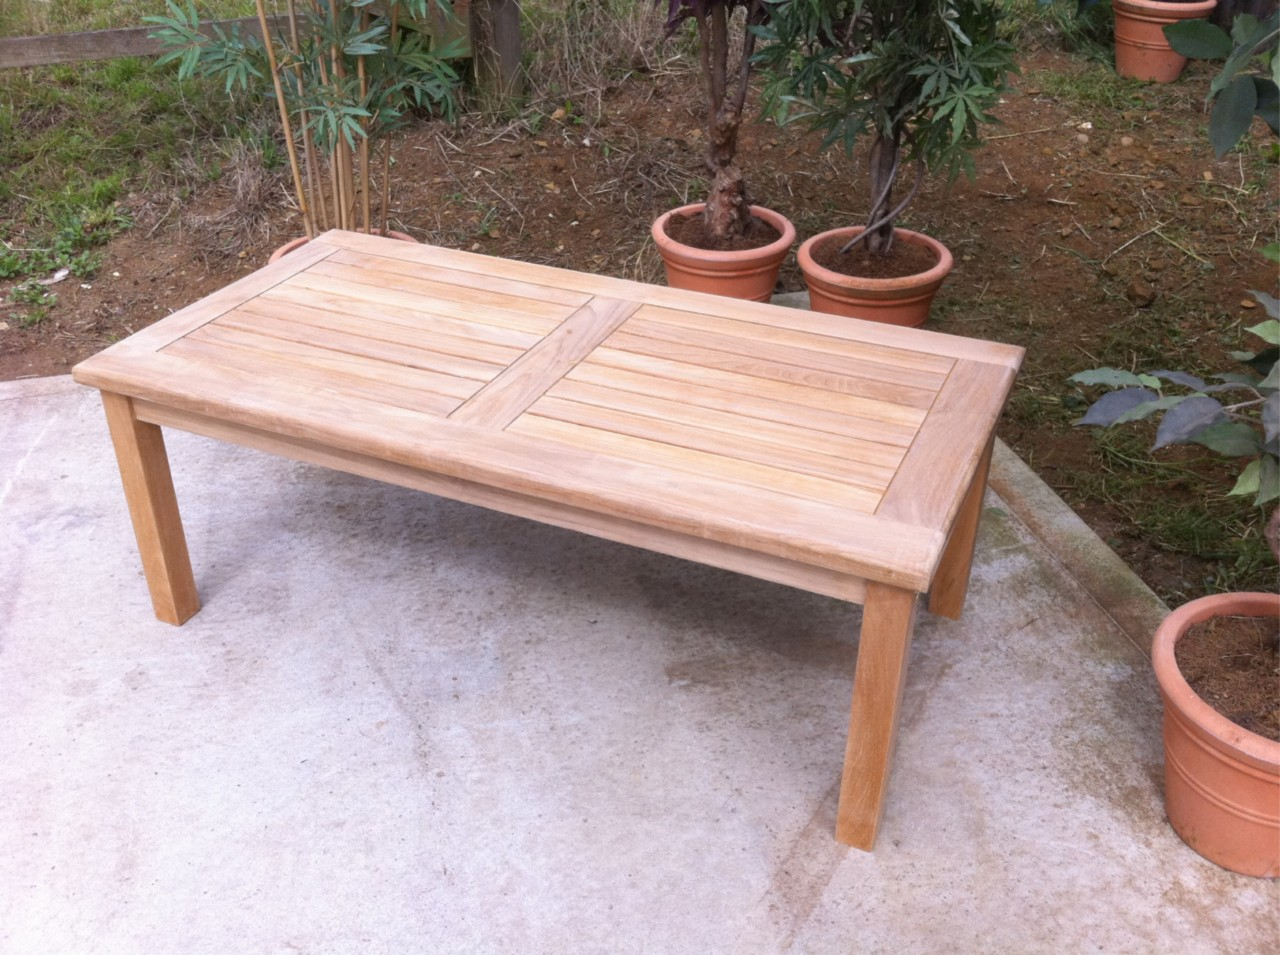 Grade A Teak Side/Coffee Table Garden Furniture Indoor | eBay